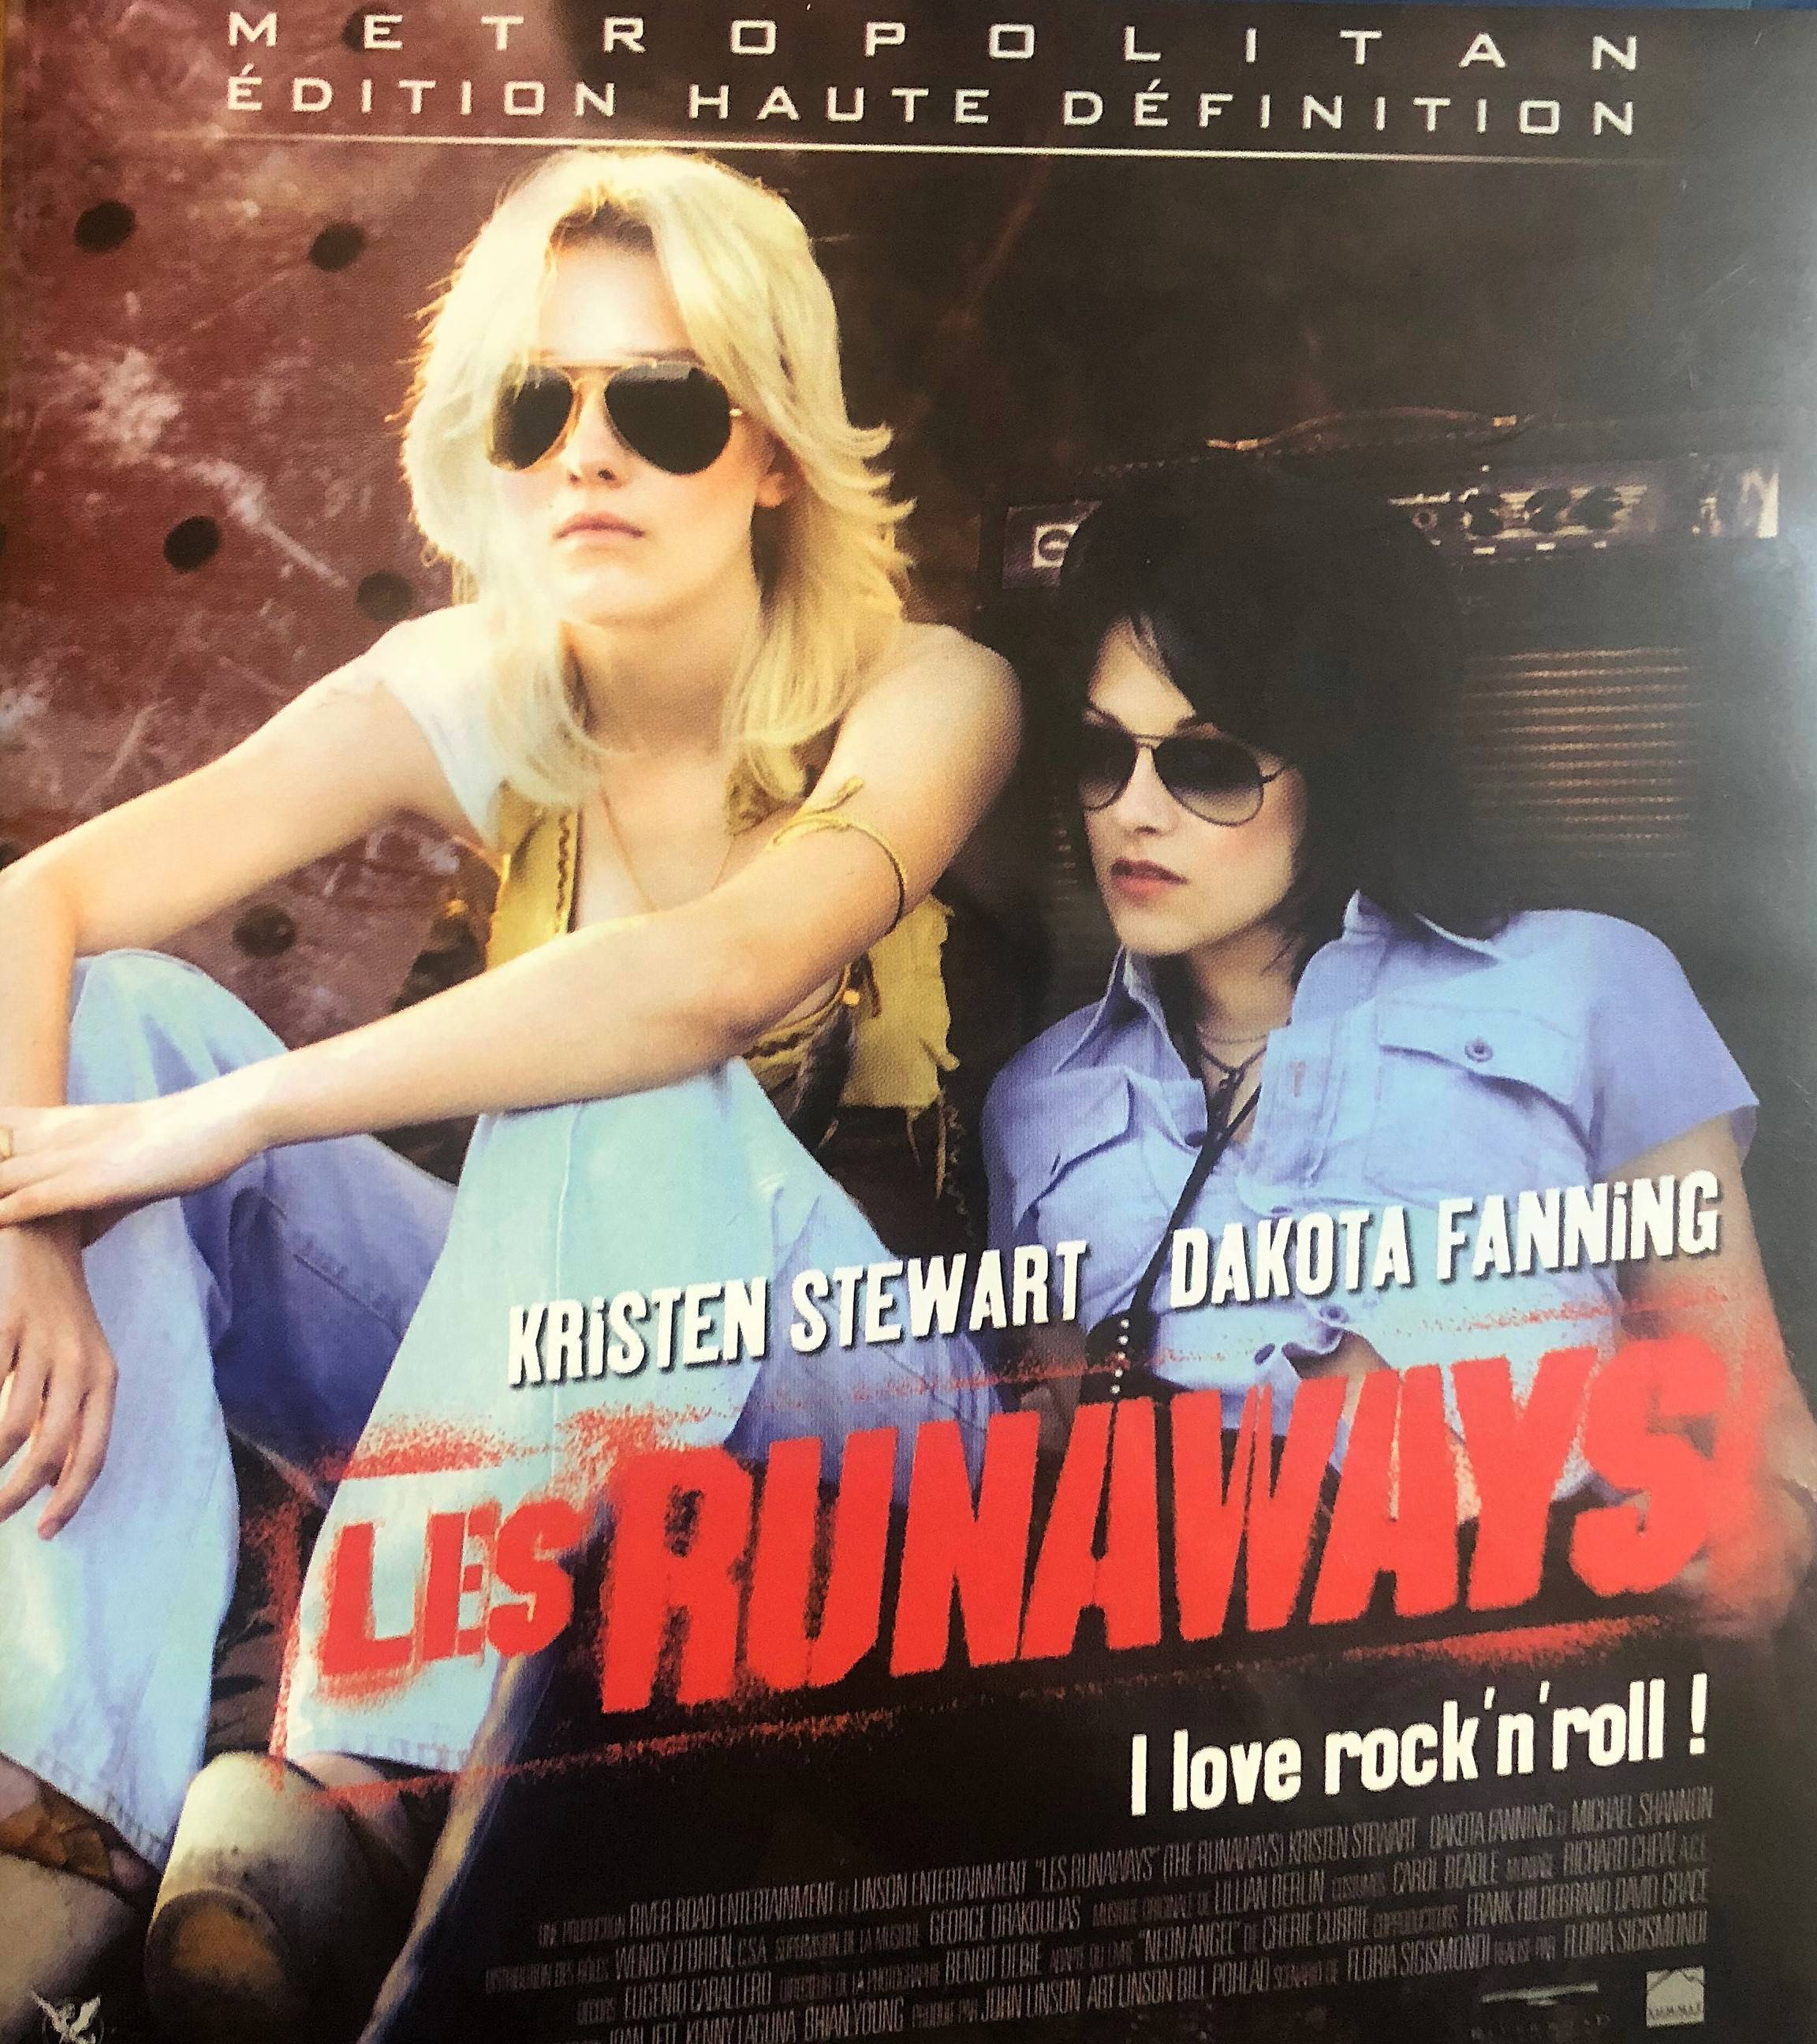 LES RUNAWAYS - Les Runaways - Others